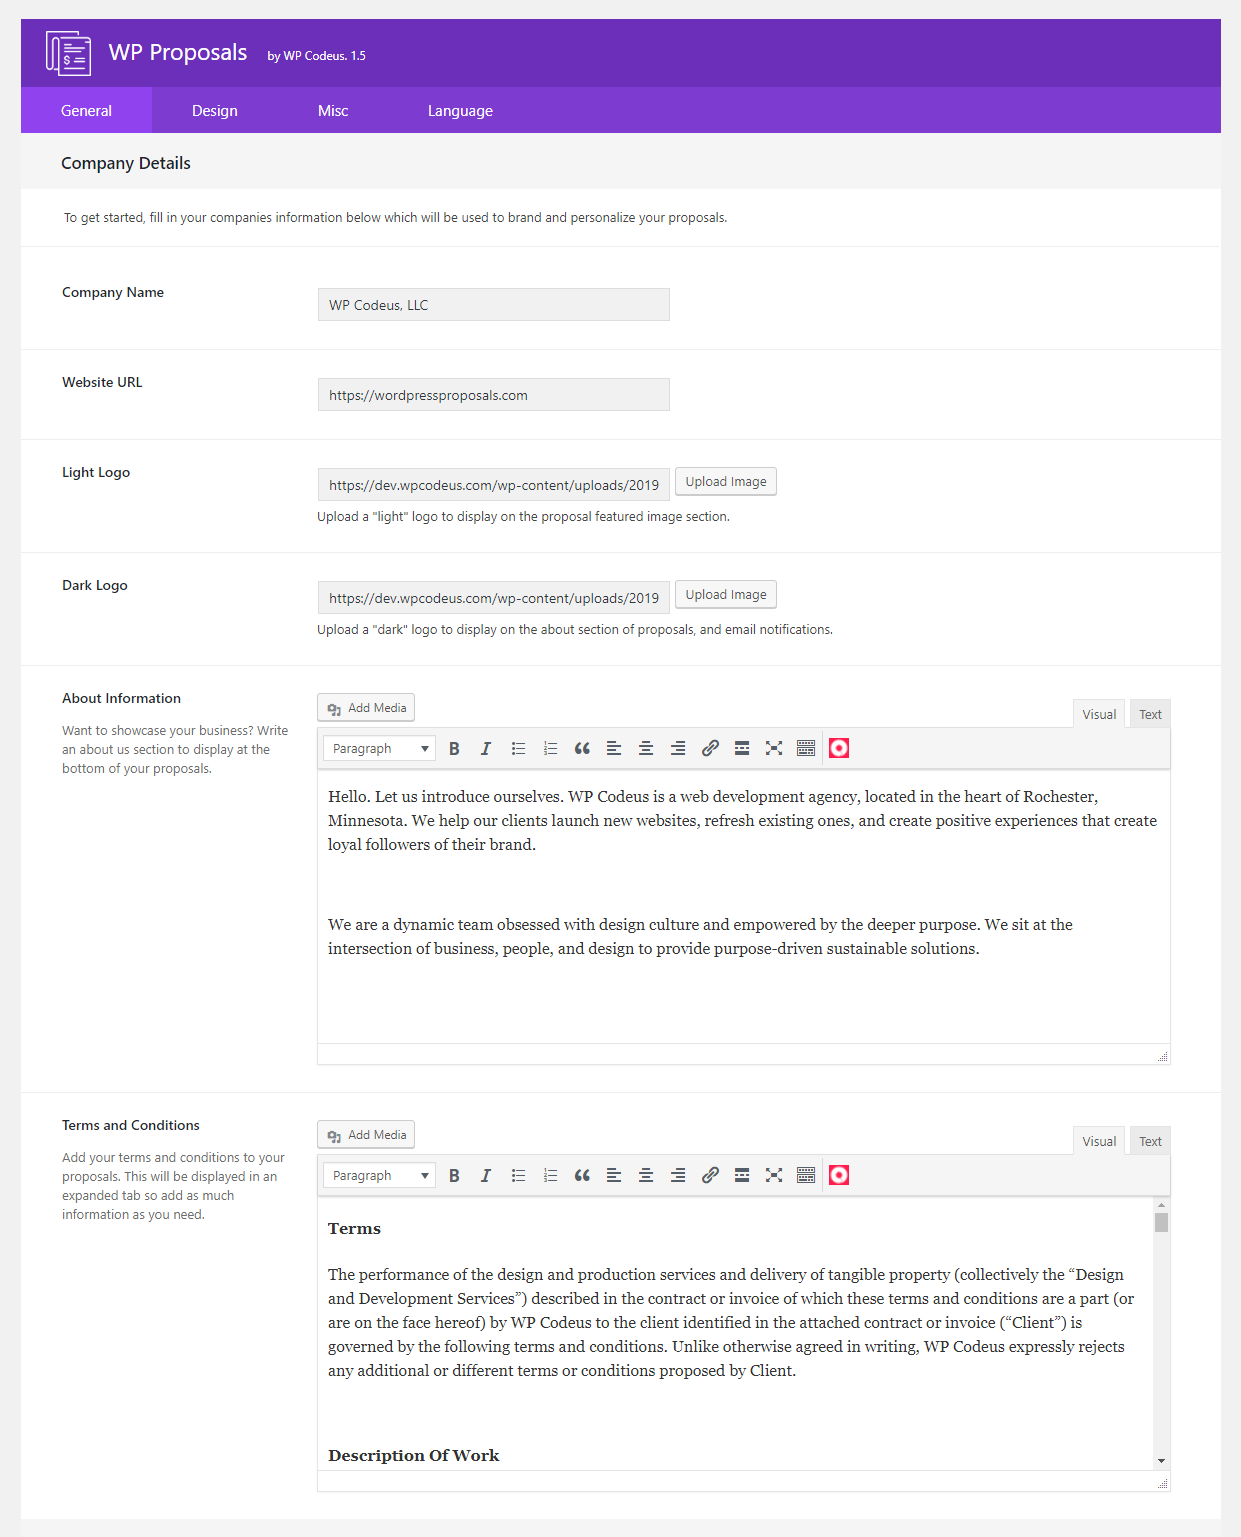 wp-proposals-company-details